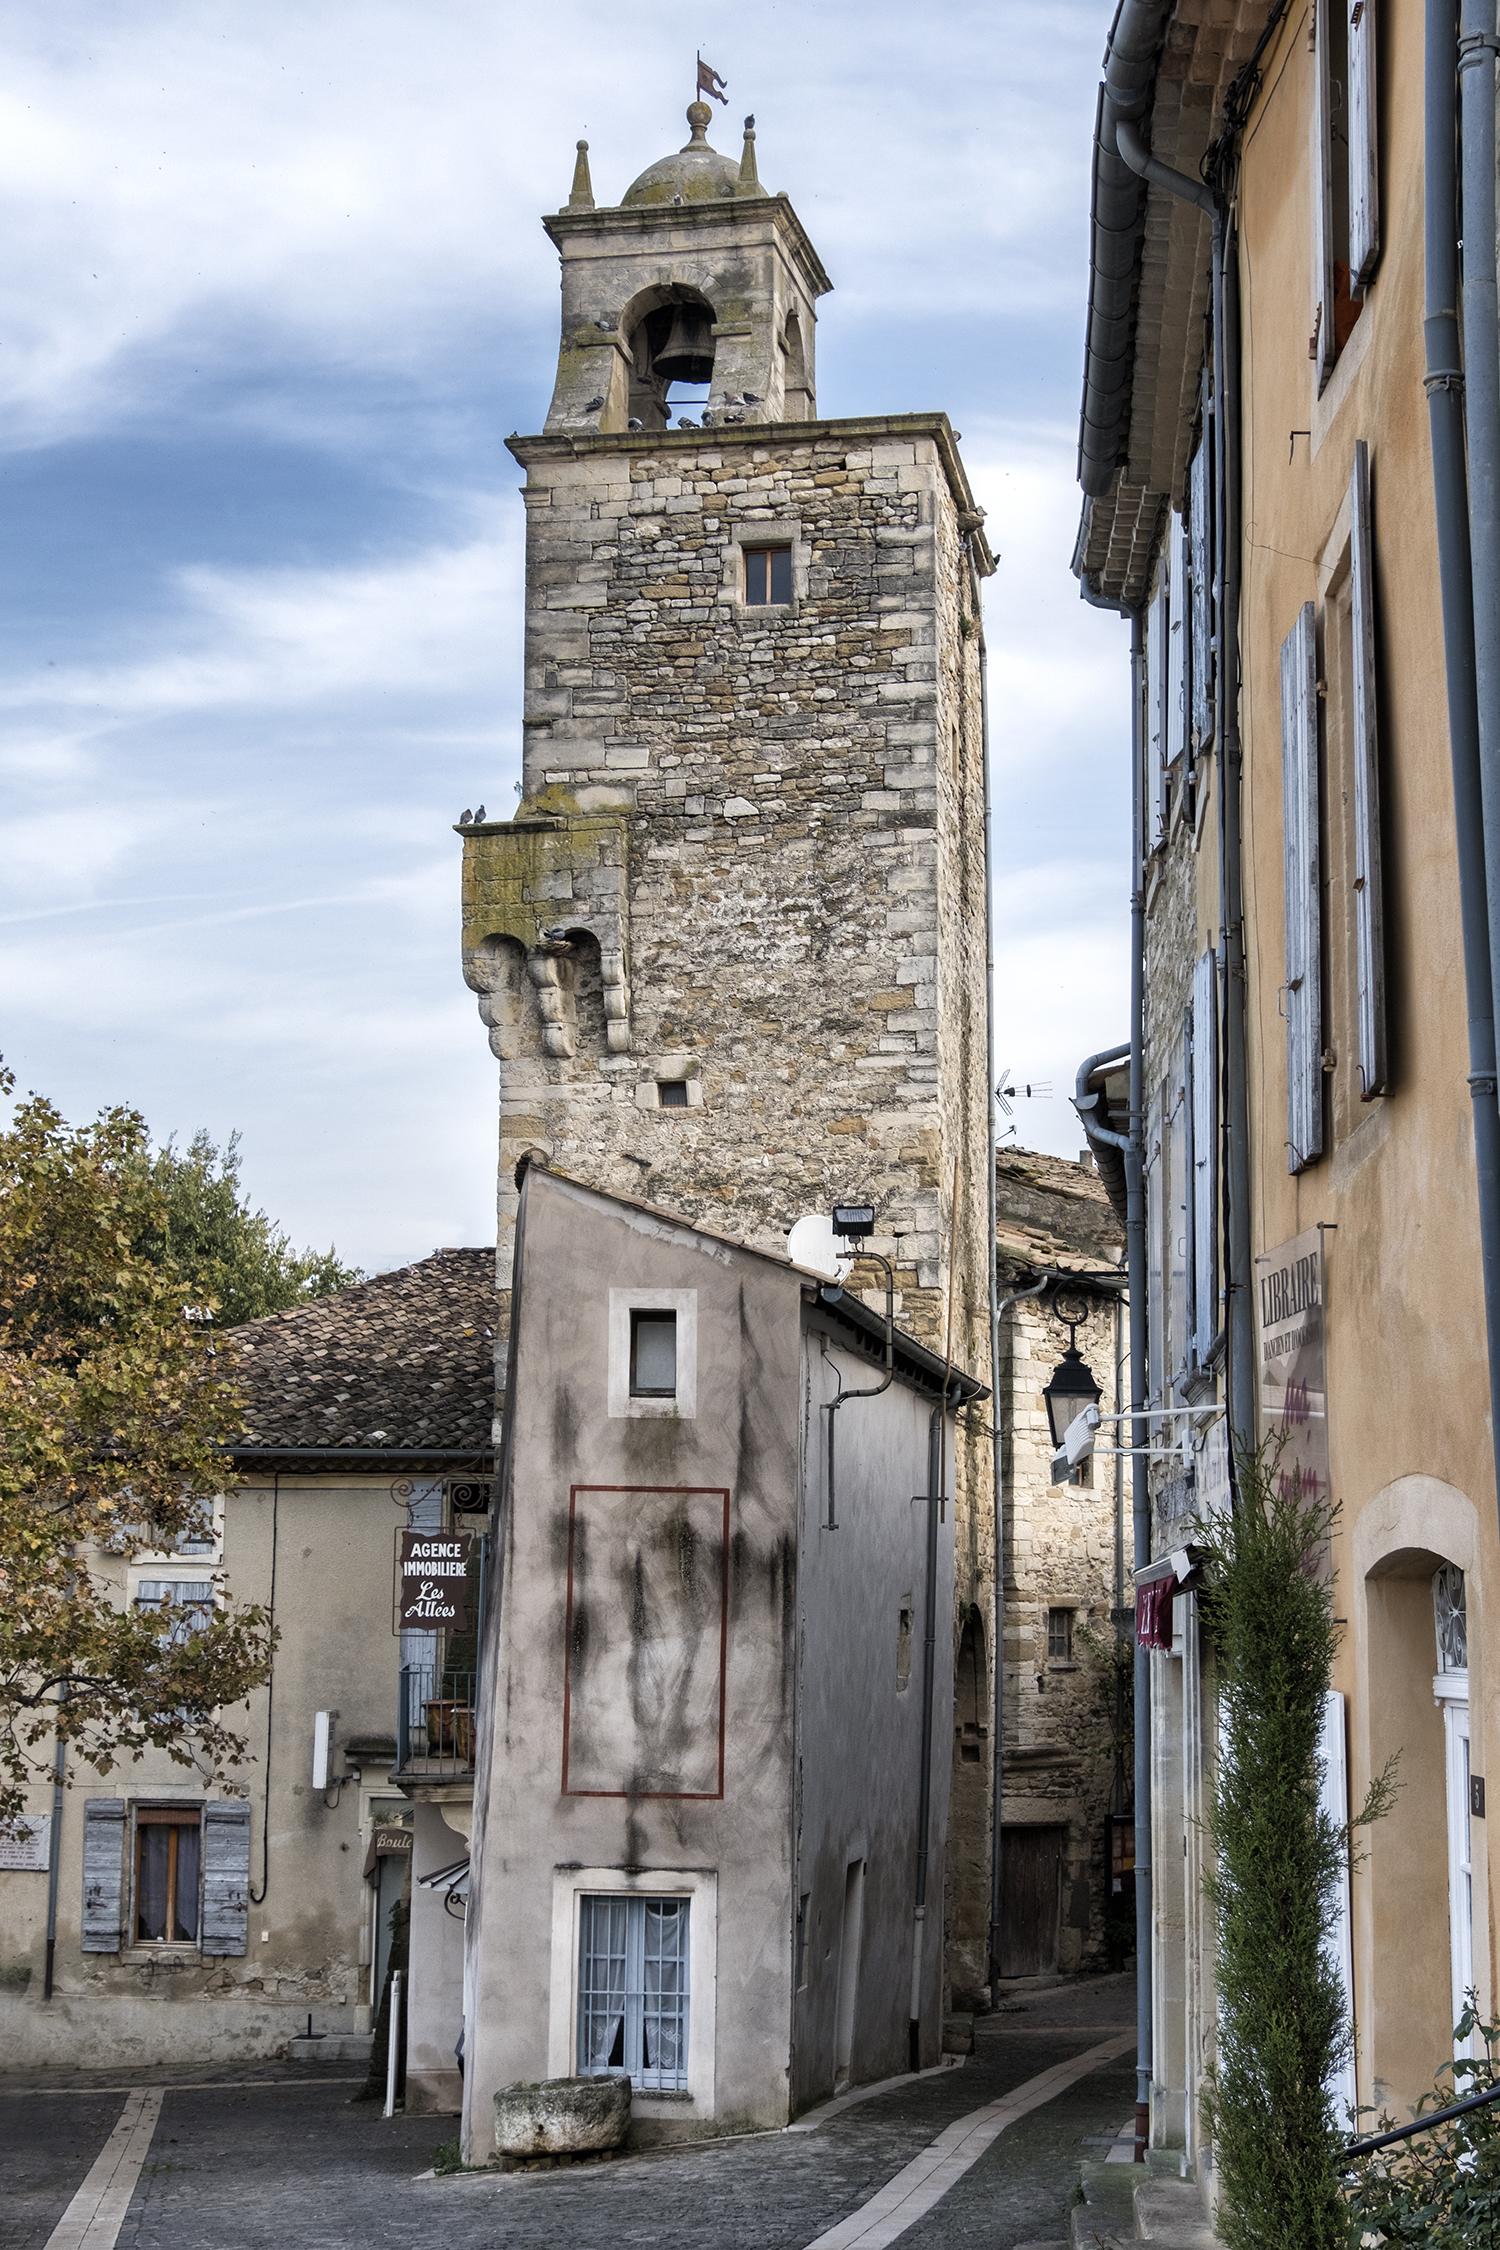 Grignan, France, October Afternoon